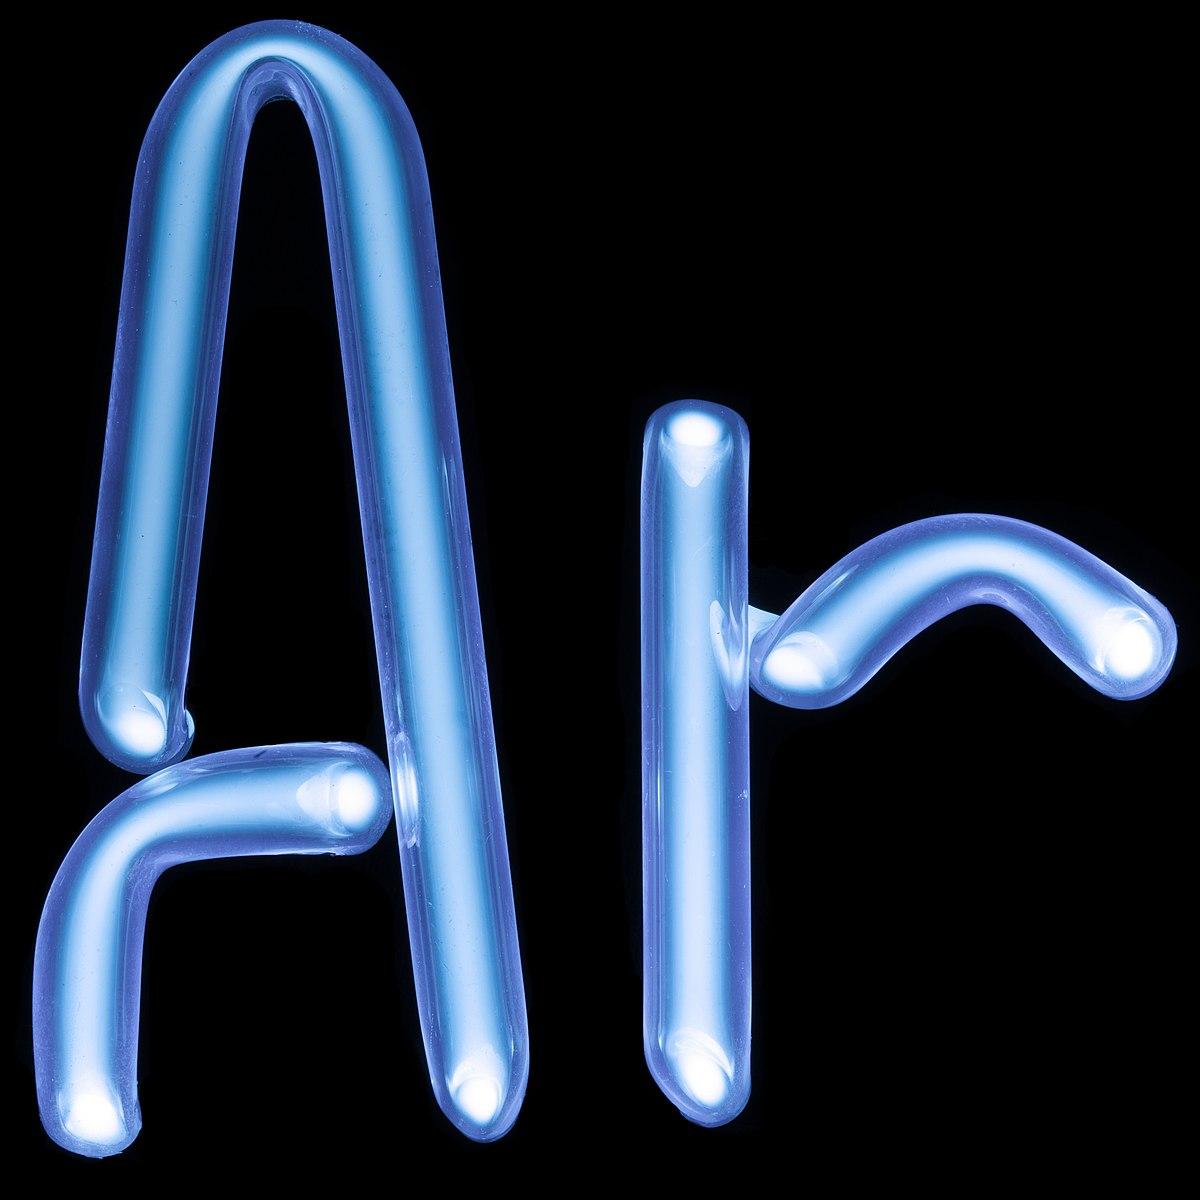 electric blue color wikipedia